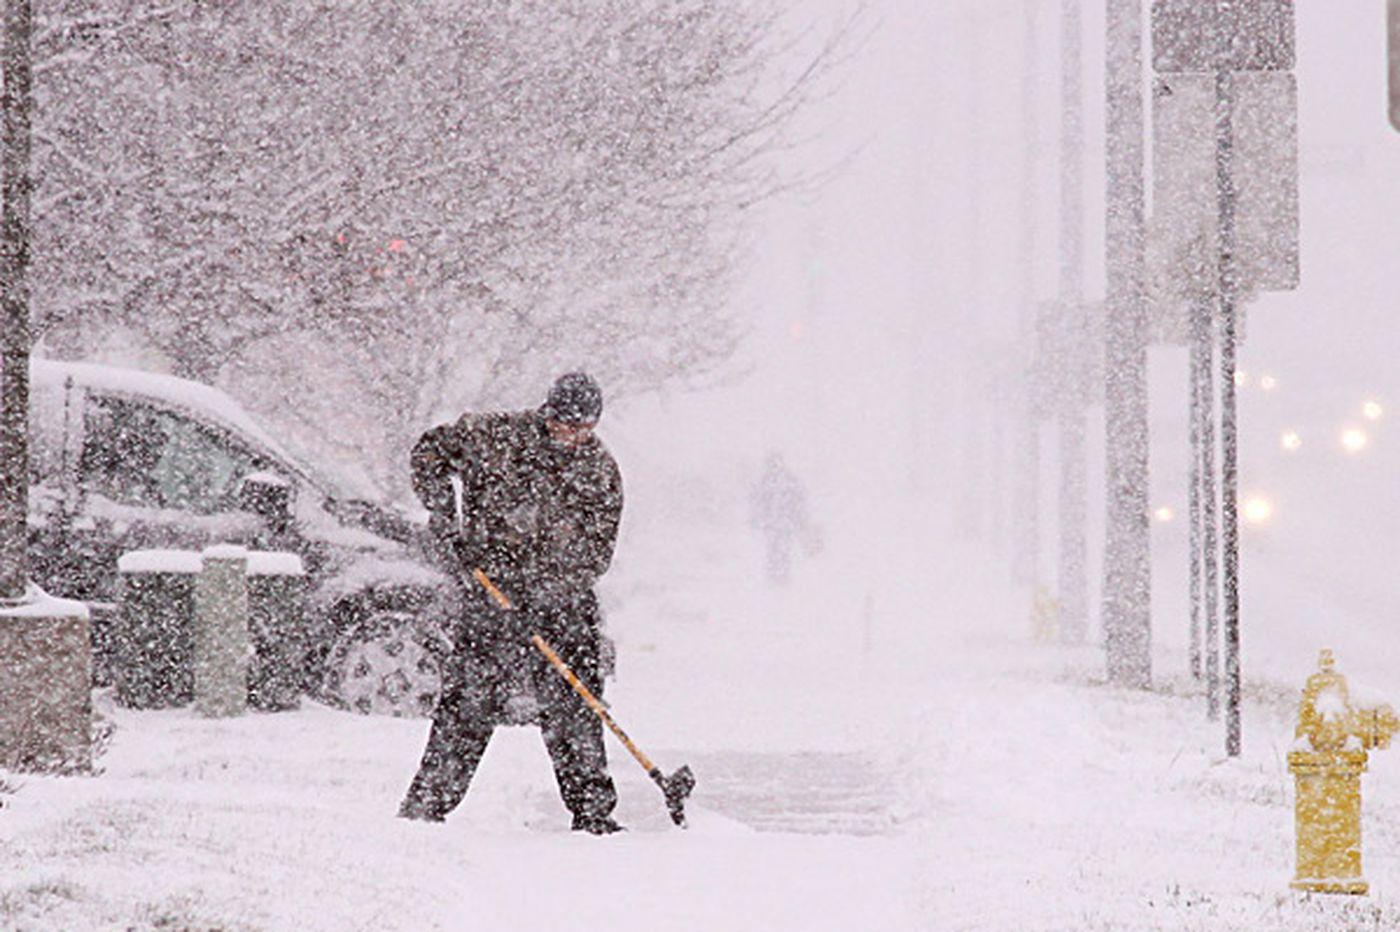 Snowstorm across the Plains closes part of I-70